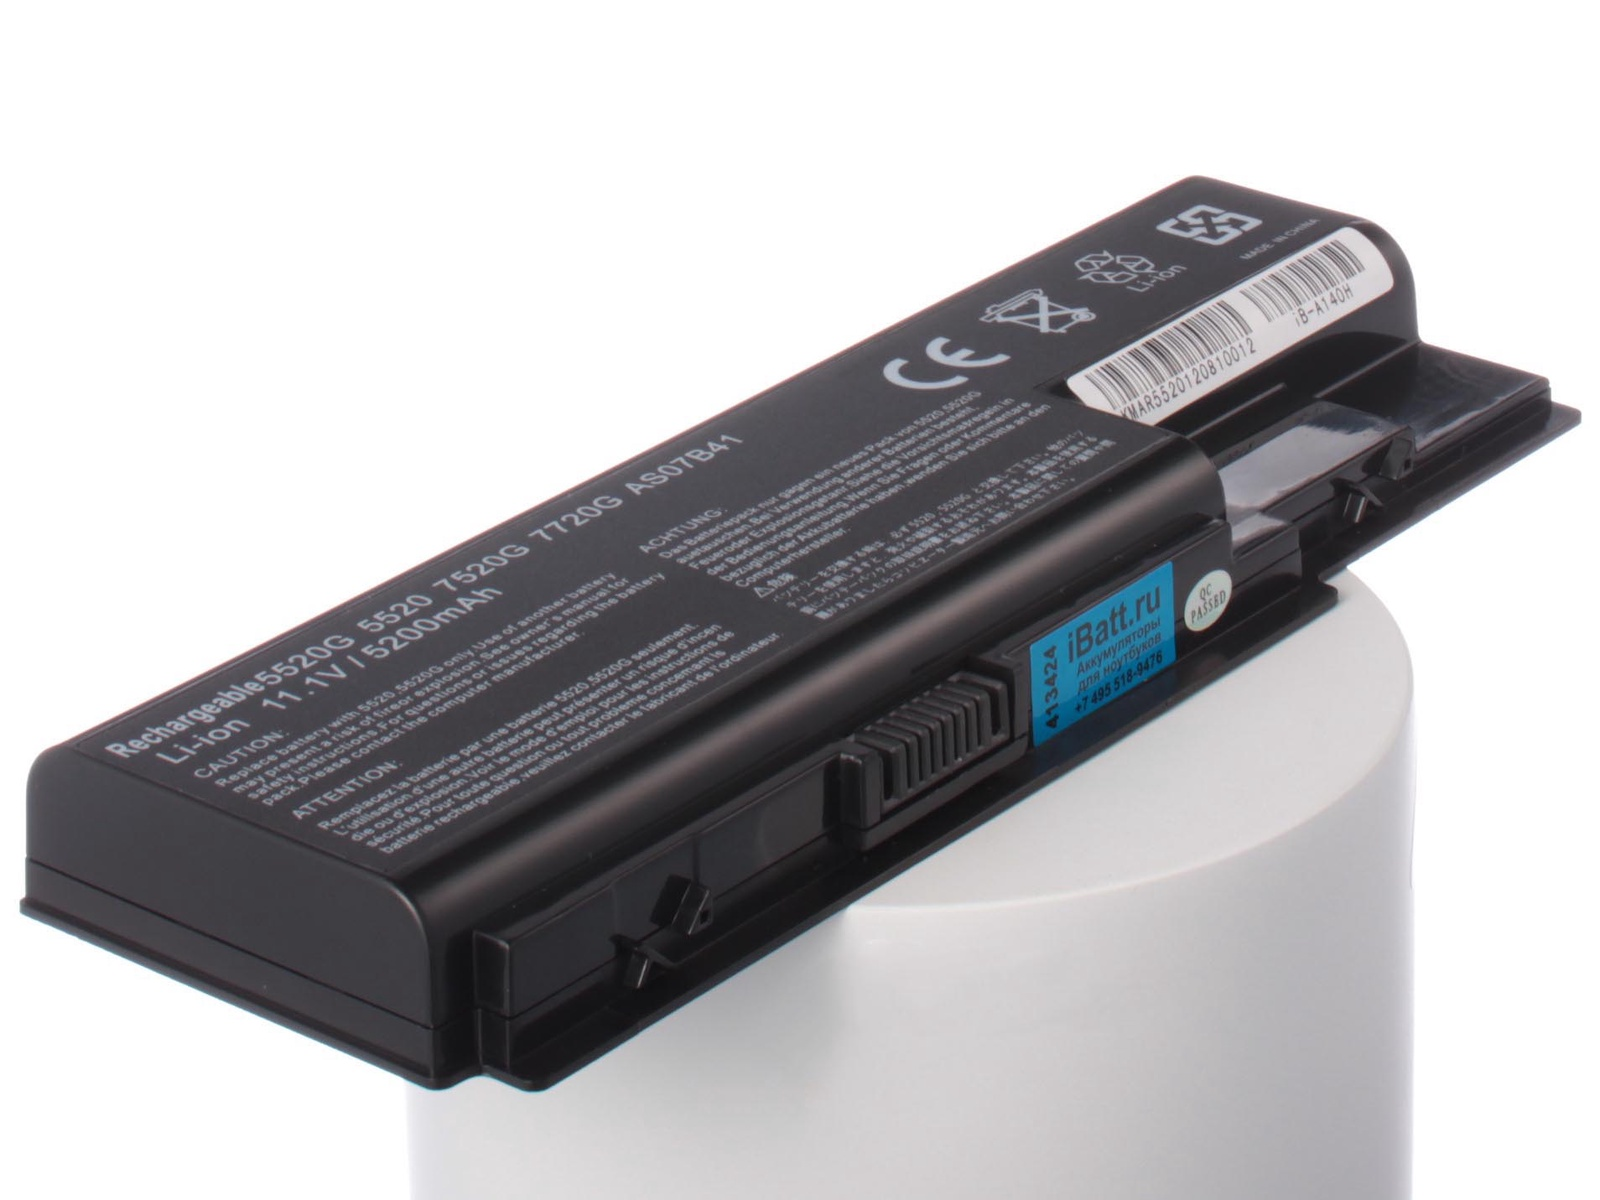 Аккумулятор для ноутбука iBatt для Acer Aspire 7220, Aspire 5940G, Aspire 8735G, Aspire 7530, Aspire 7535G, Aspire 7740G, Aspire 5710, Aspire 8935G, Extensa 7230E, Aspire 5730, Aspire 7738, Aspire 8530G-654G32Mi, Extensa 7230 цена